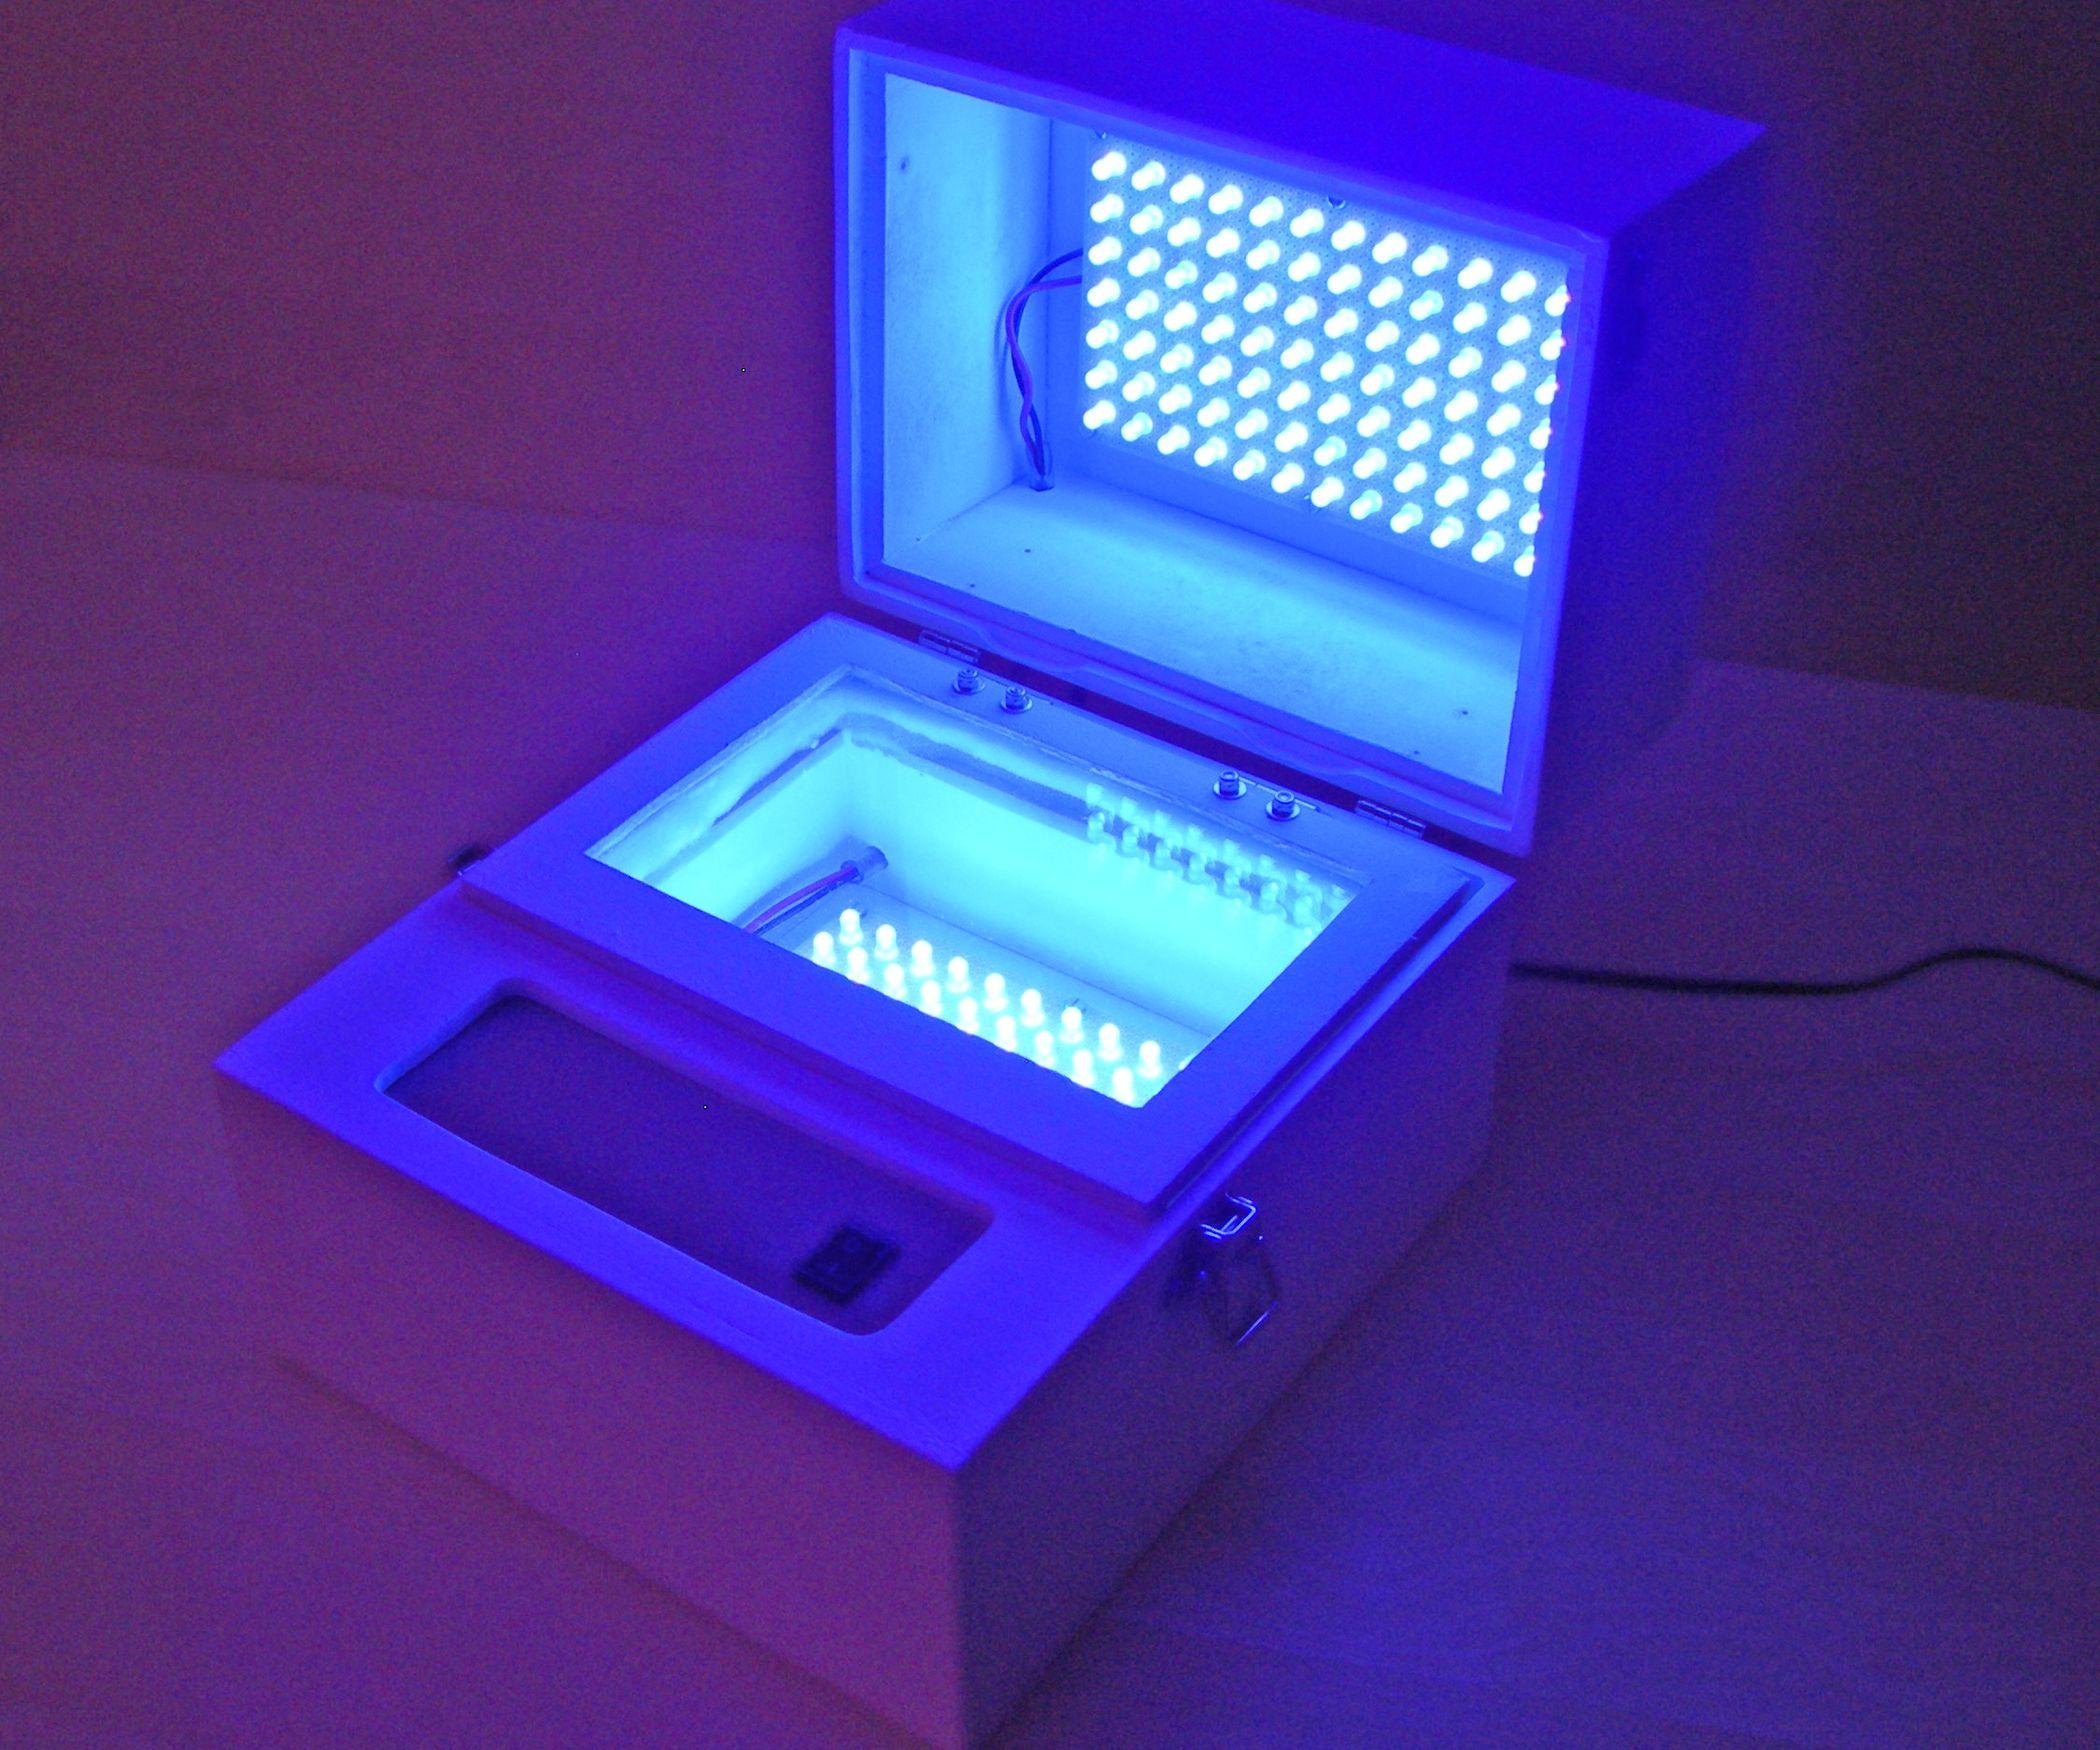 UV LED Exposure Box | Pinterest